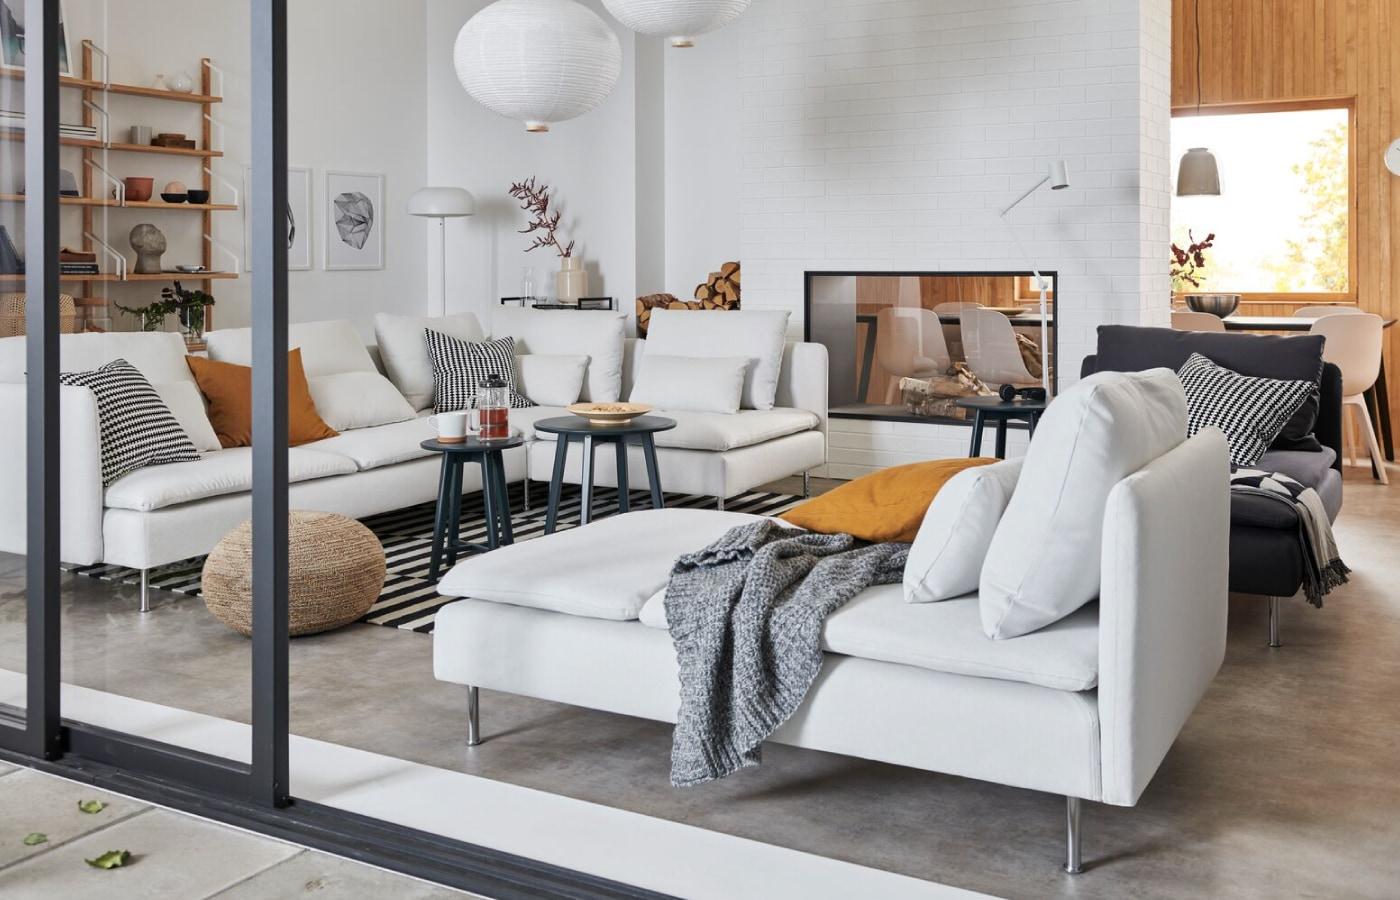 Interior Design Service For Your Home Ikea